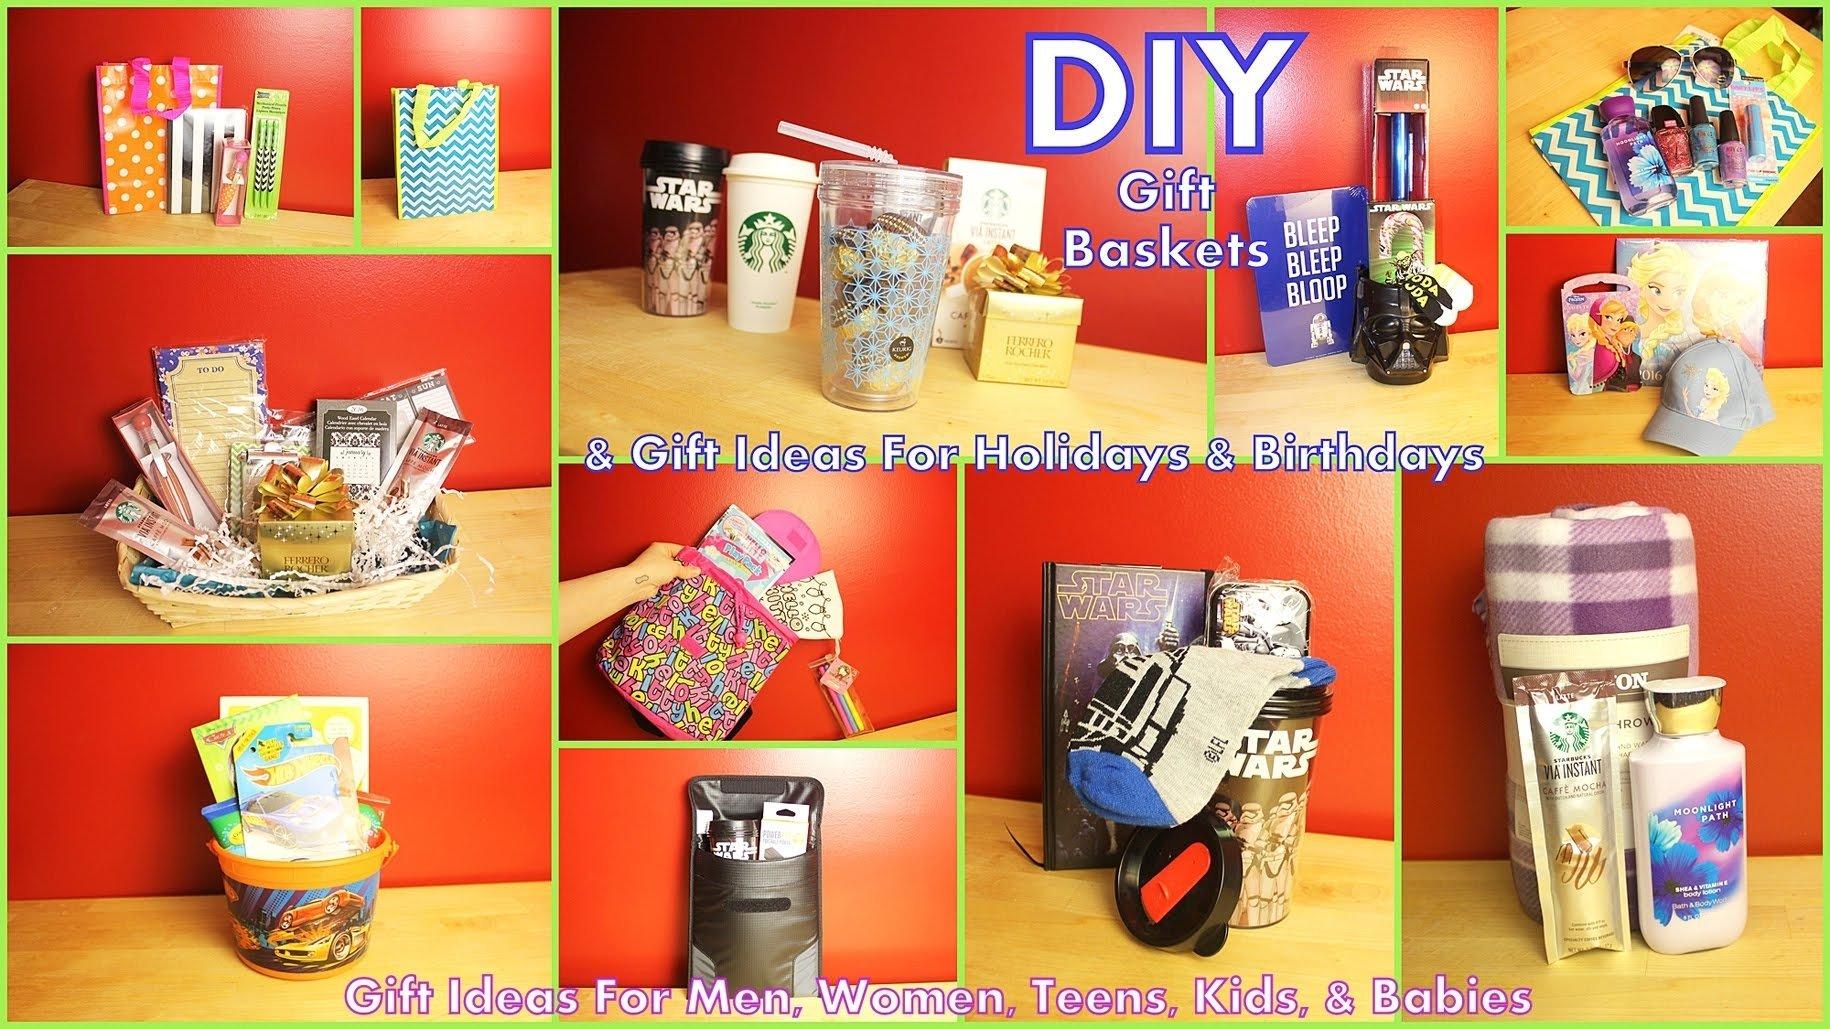 10 Cute Gift Baskets For Men Ideas diy gift baskets gift ideas how to assemble for men women kids 3 2020